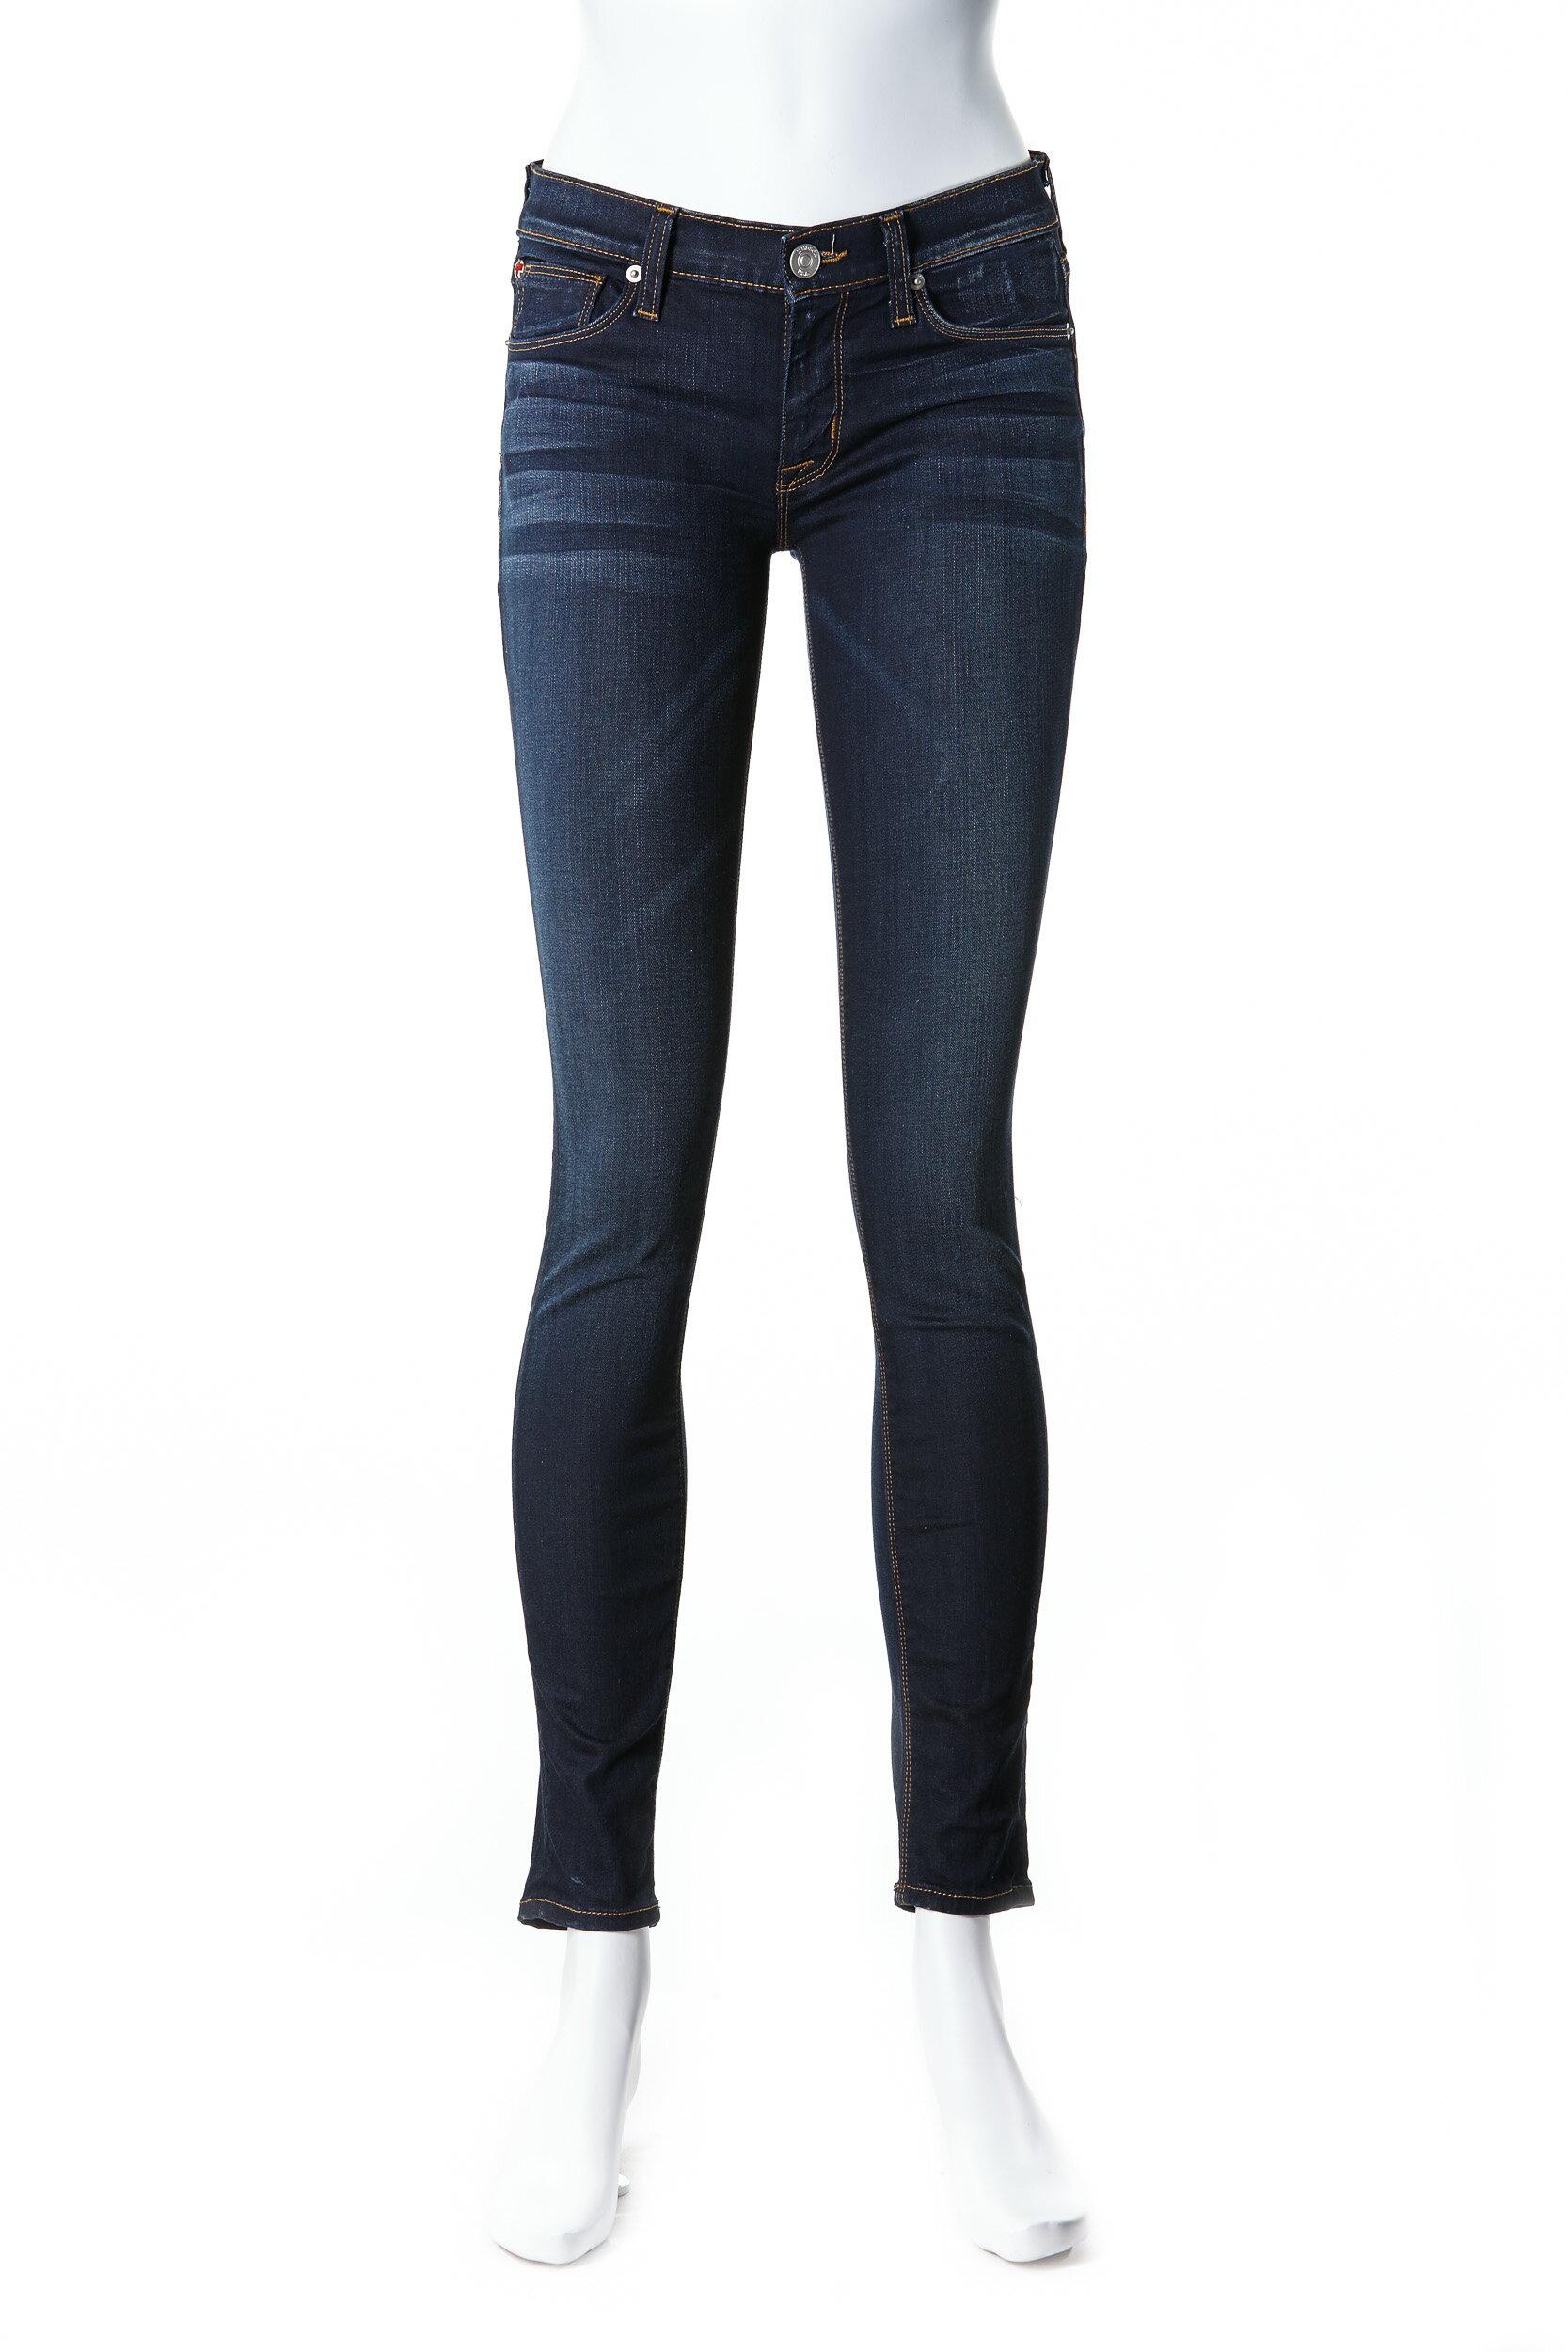 HUDSON KRISTA系列 極窄管牛仔褲 美國製造 現貨供應 【美國好褲】